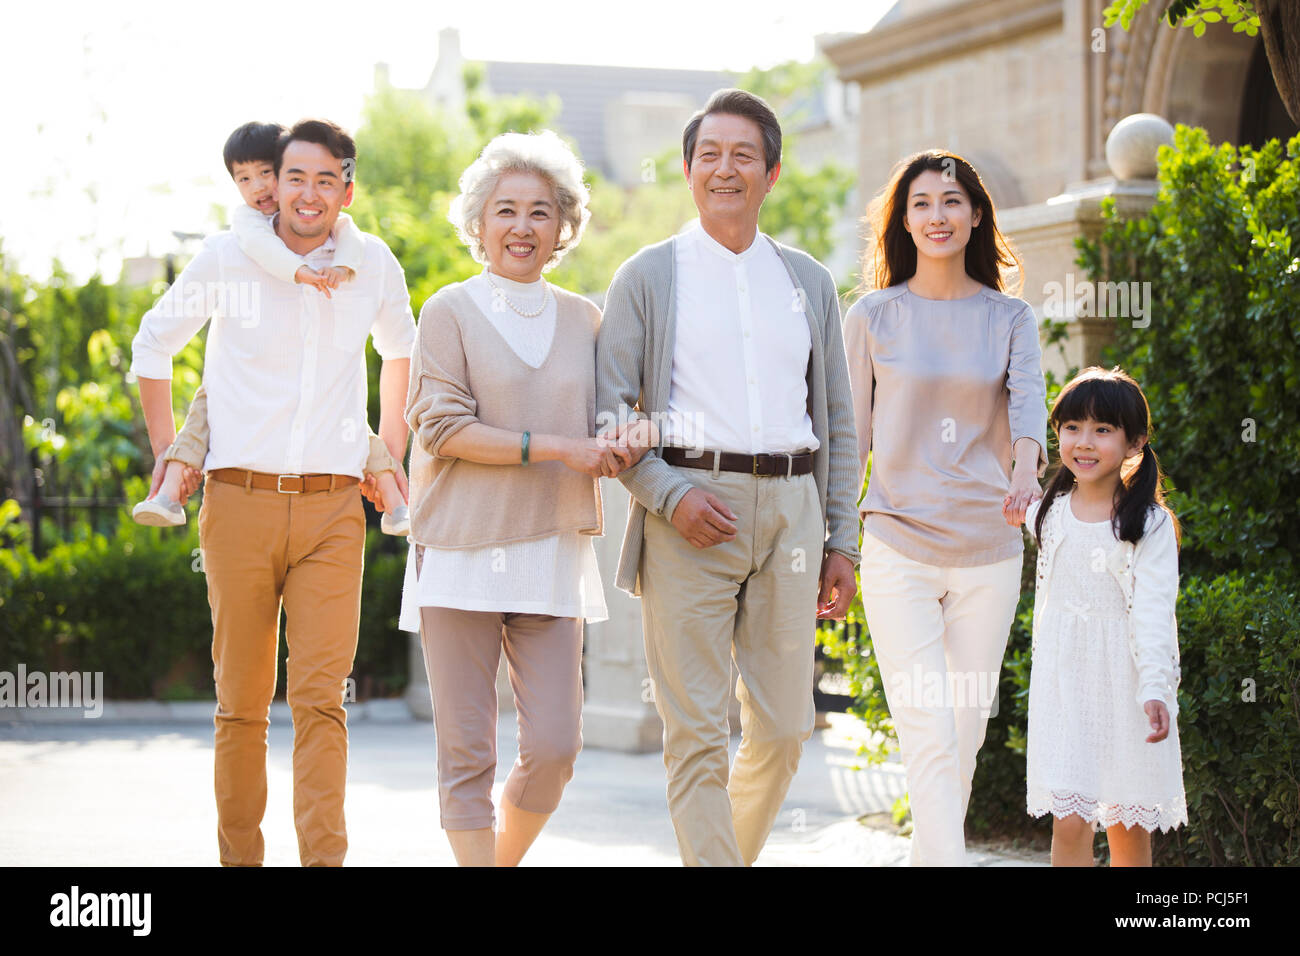 Feliz familia china paseando fuera Imagen De Stock